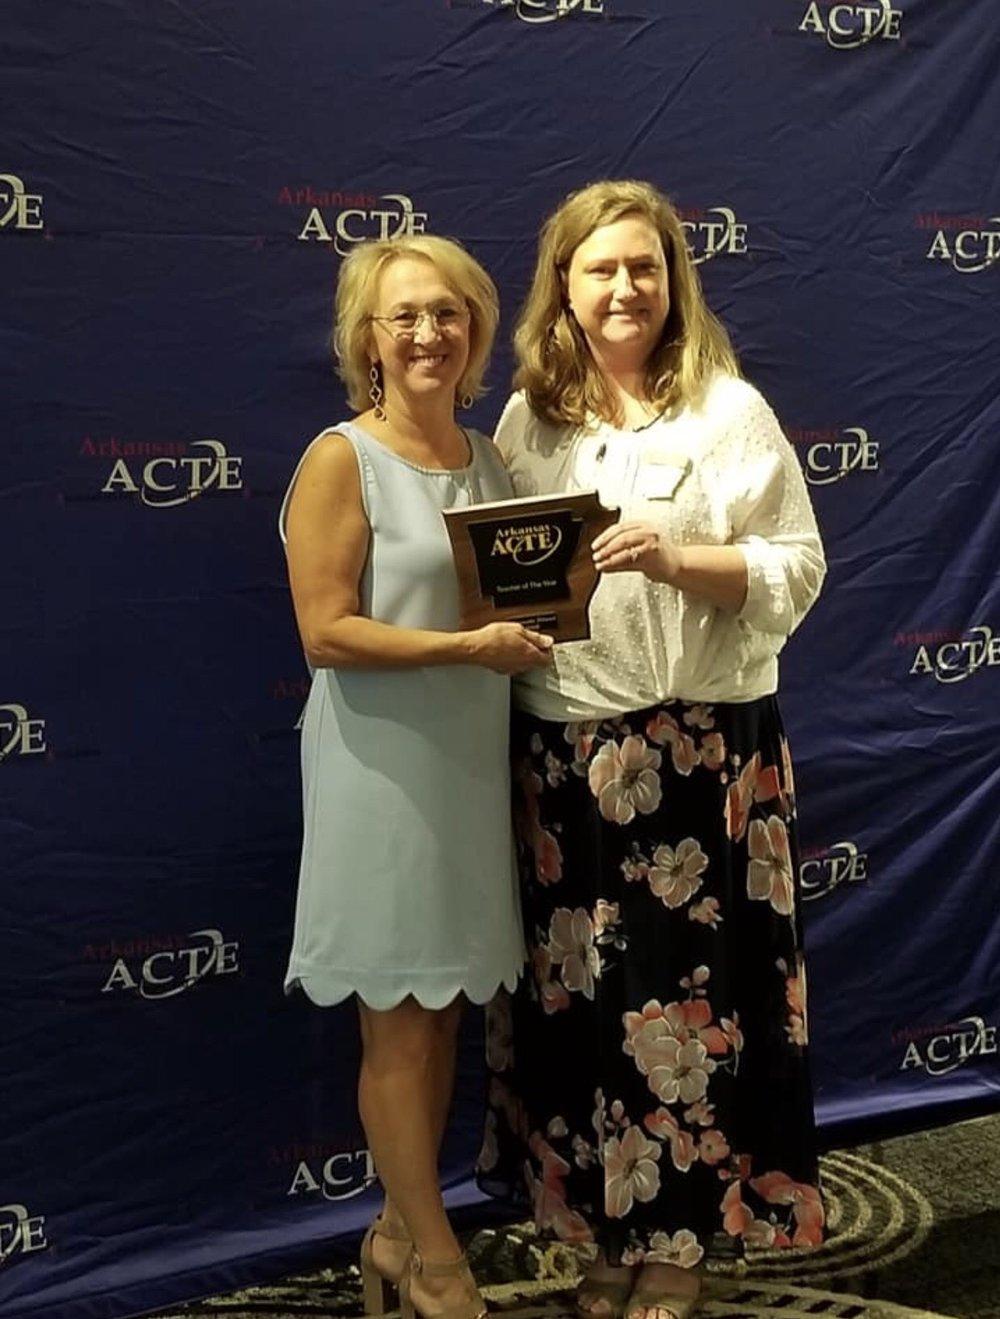 - Vilonia High School teacher Maynette Stroud was awarded the ACTE Teacher of the Year Award.